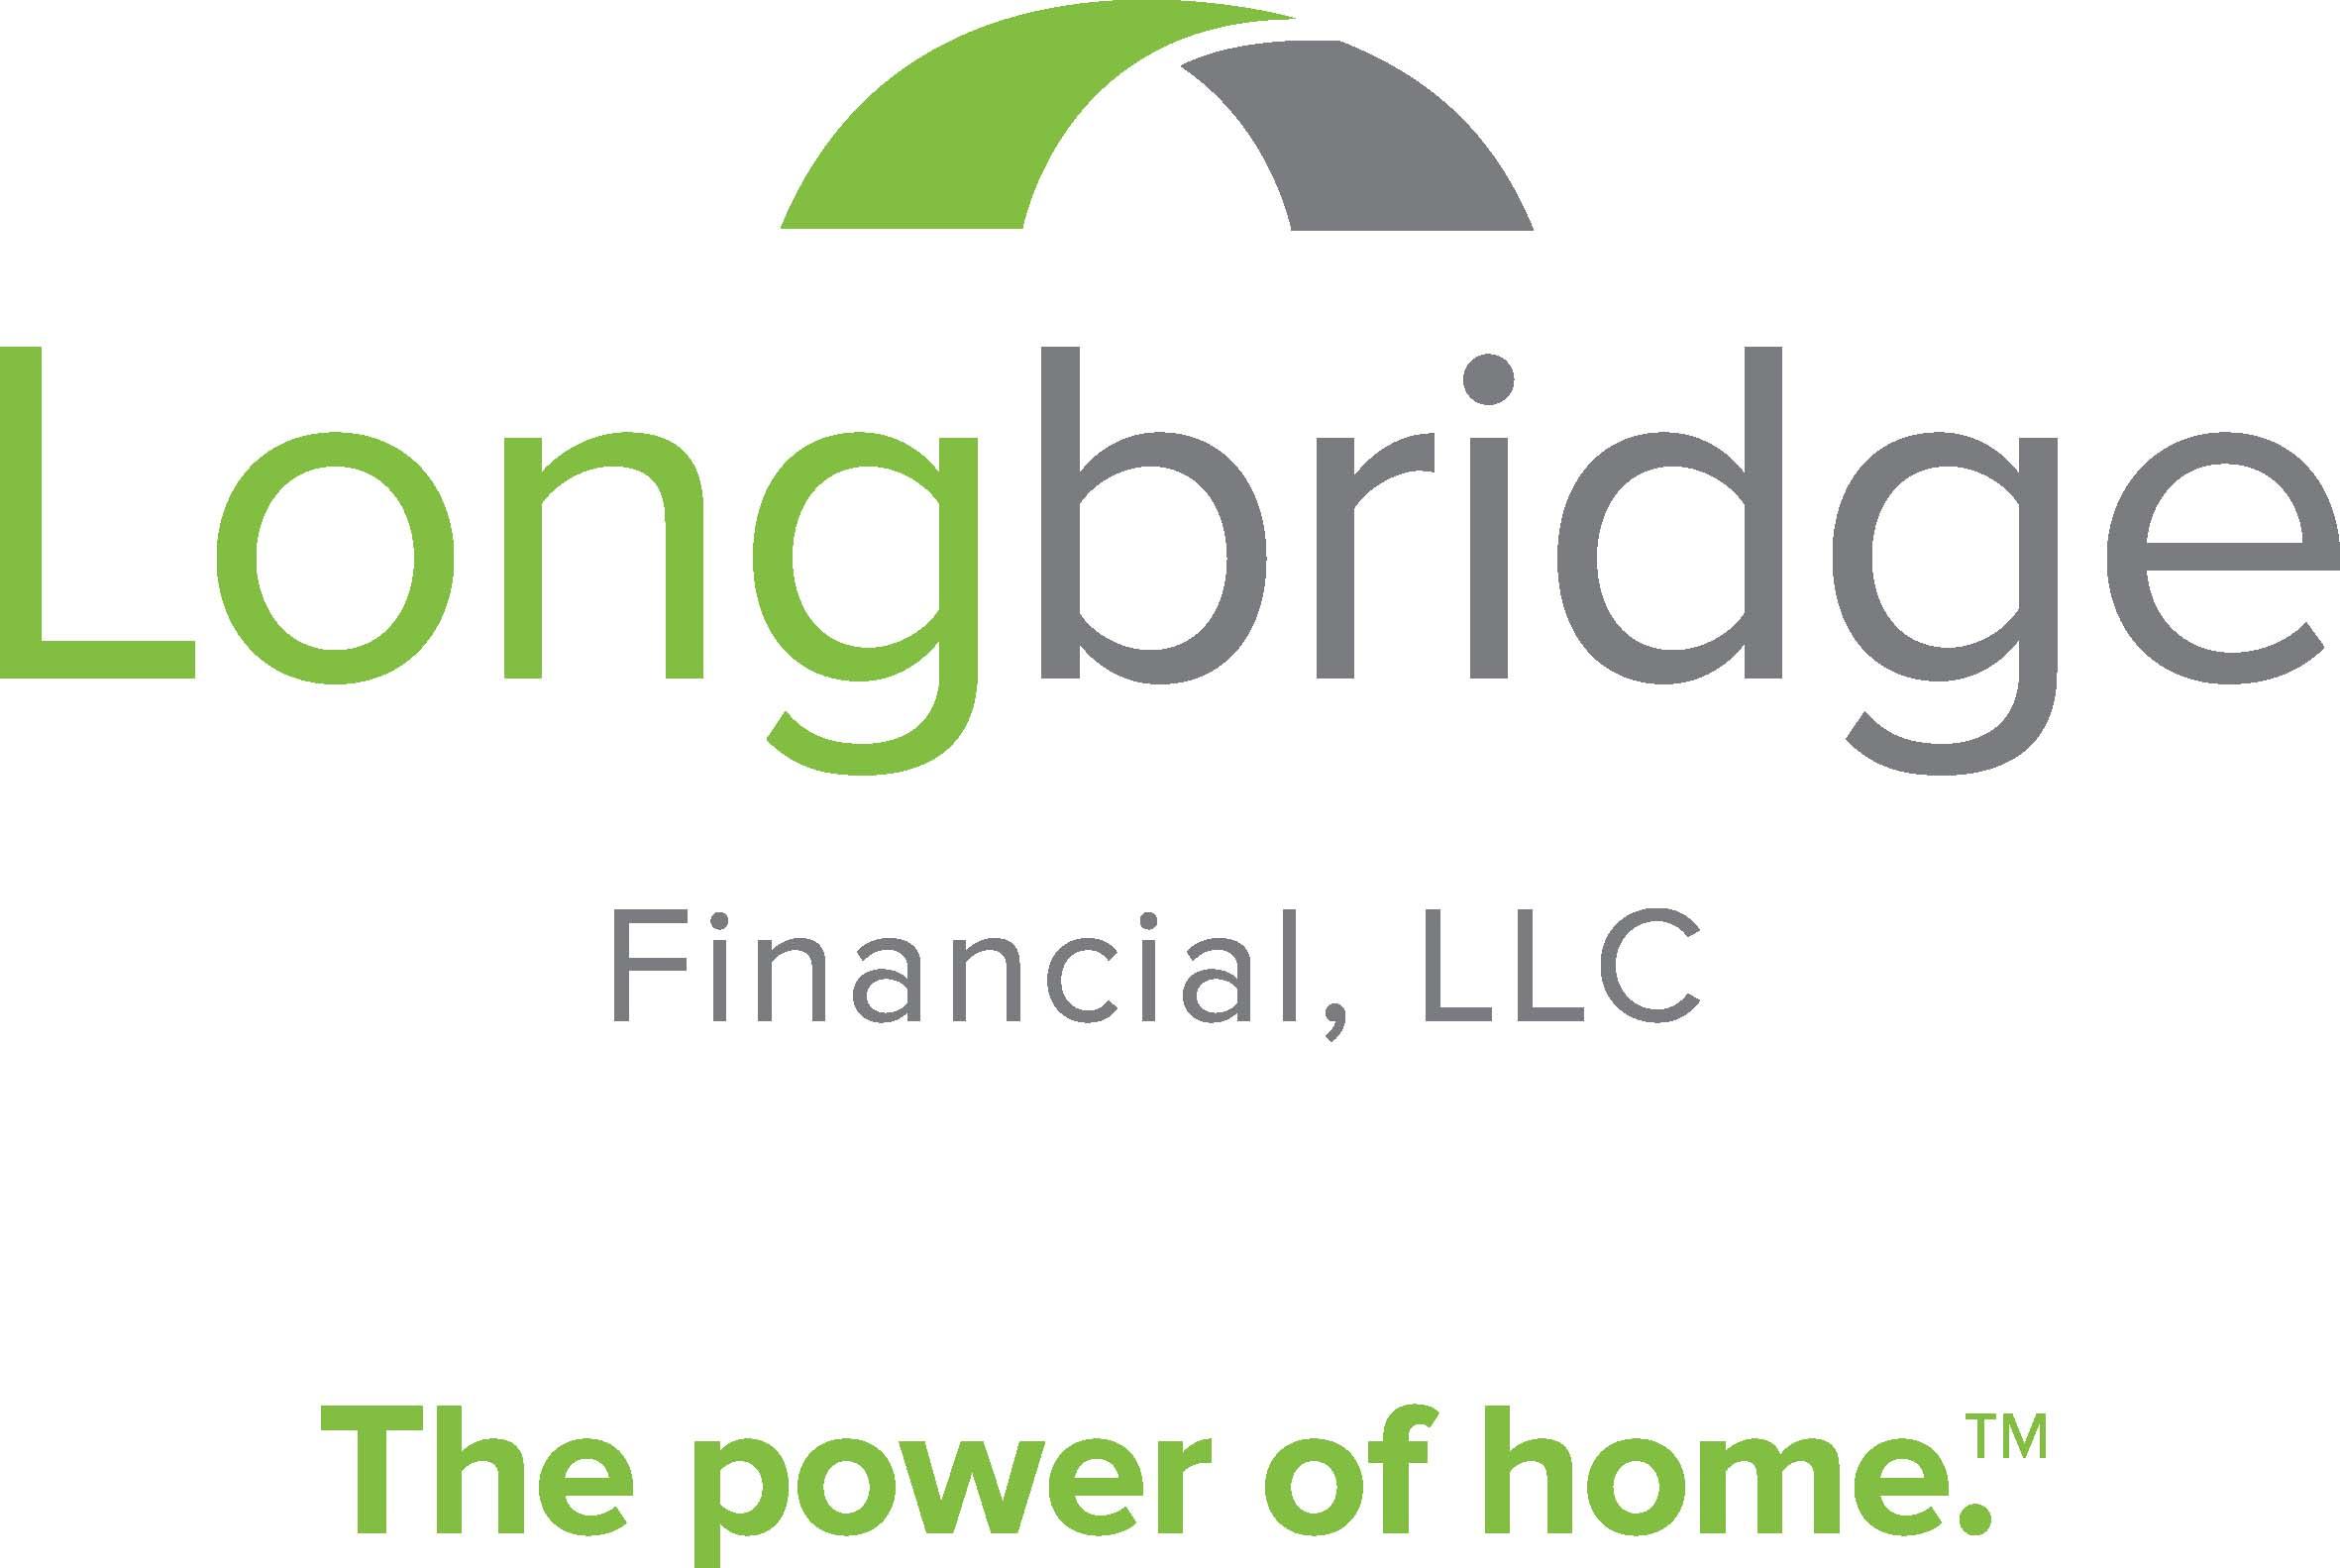 Longbridge Financial, LLC